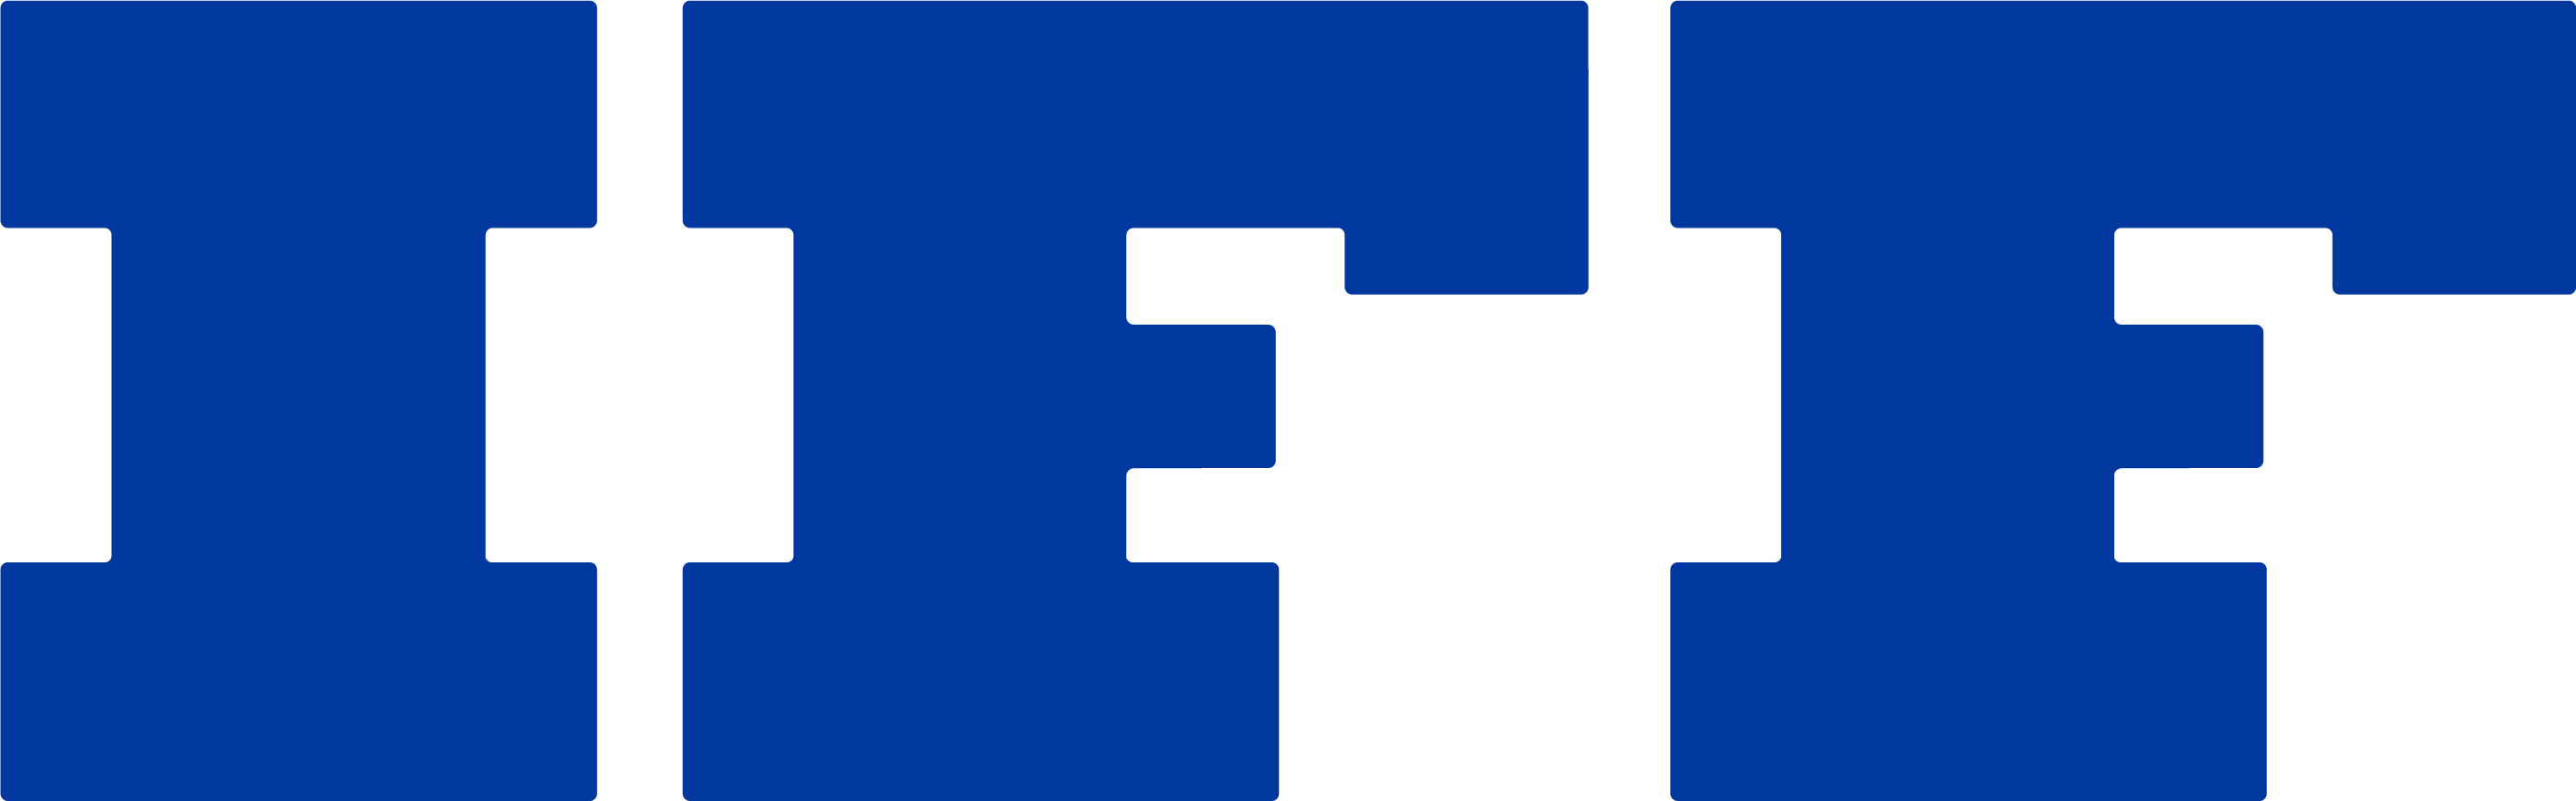 Bridge2Food_Logo_2018_Protein_Summit_IFF